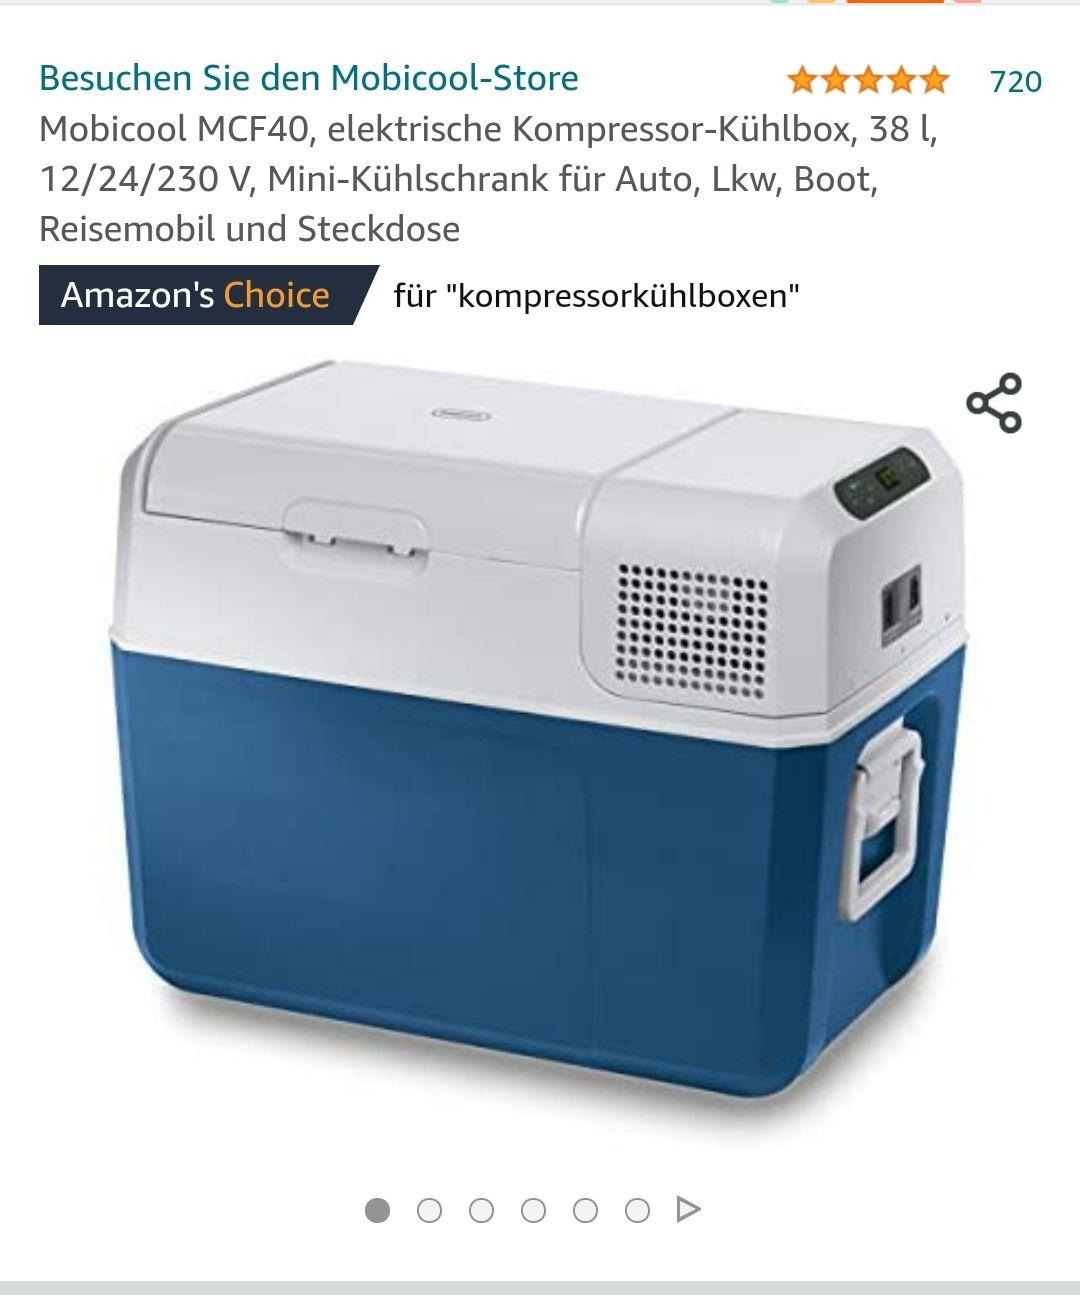 Mobicool MCF40, elektrische Kompressor-Kühlbox, 38 l, 12/24/230 V